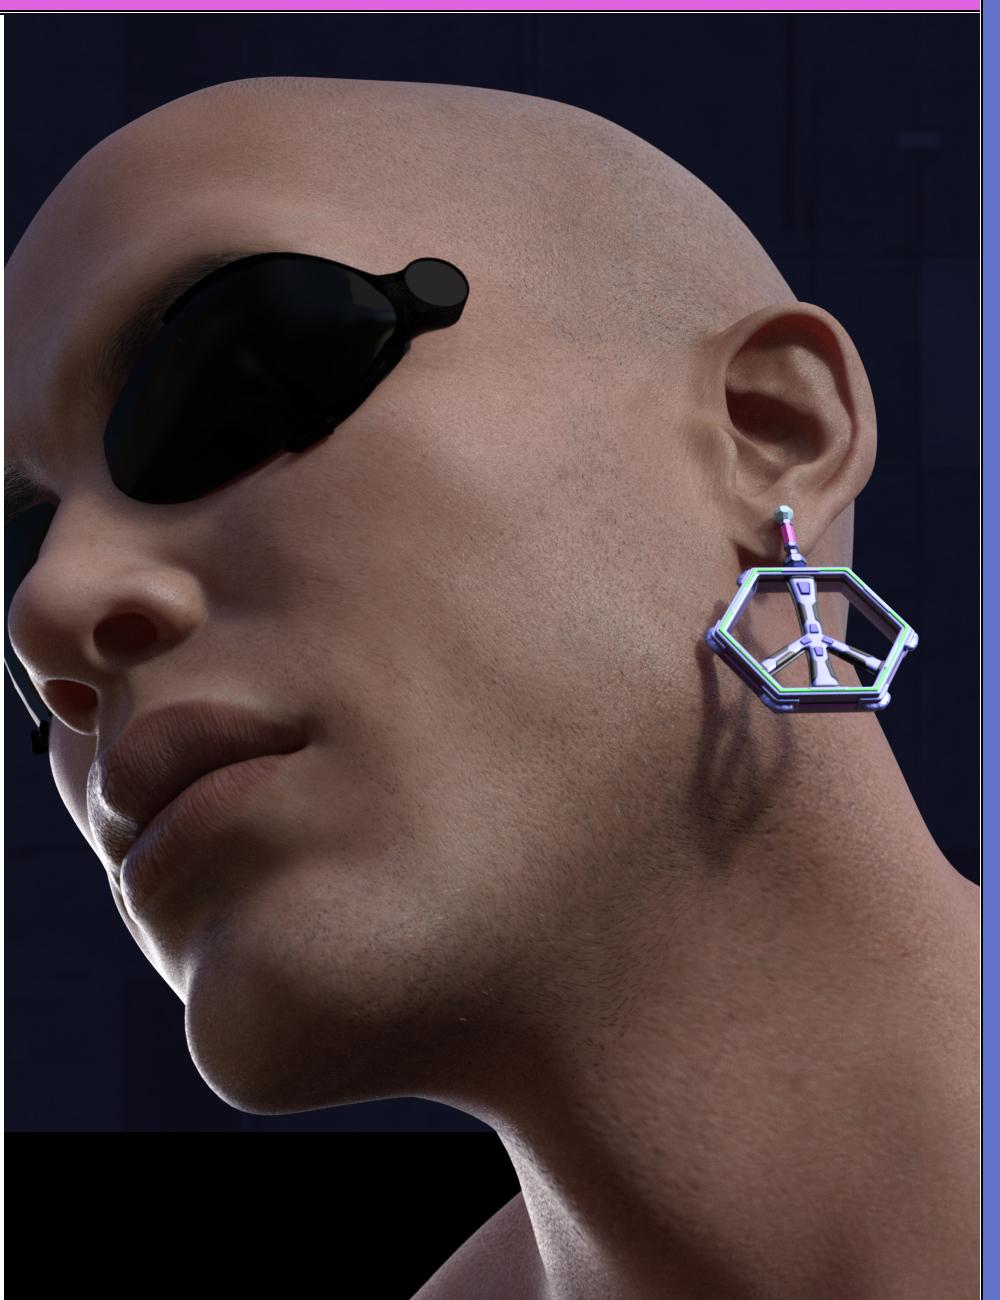 Just Earrings - El Nano Punk'd by: inception8, 3D Models by Daz 3D